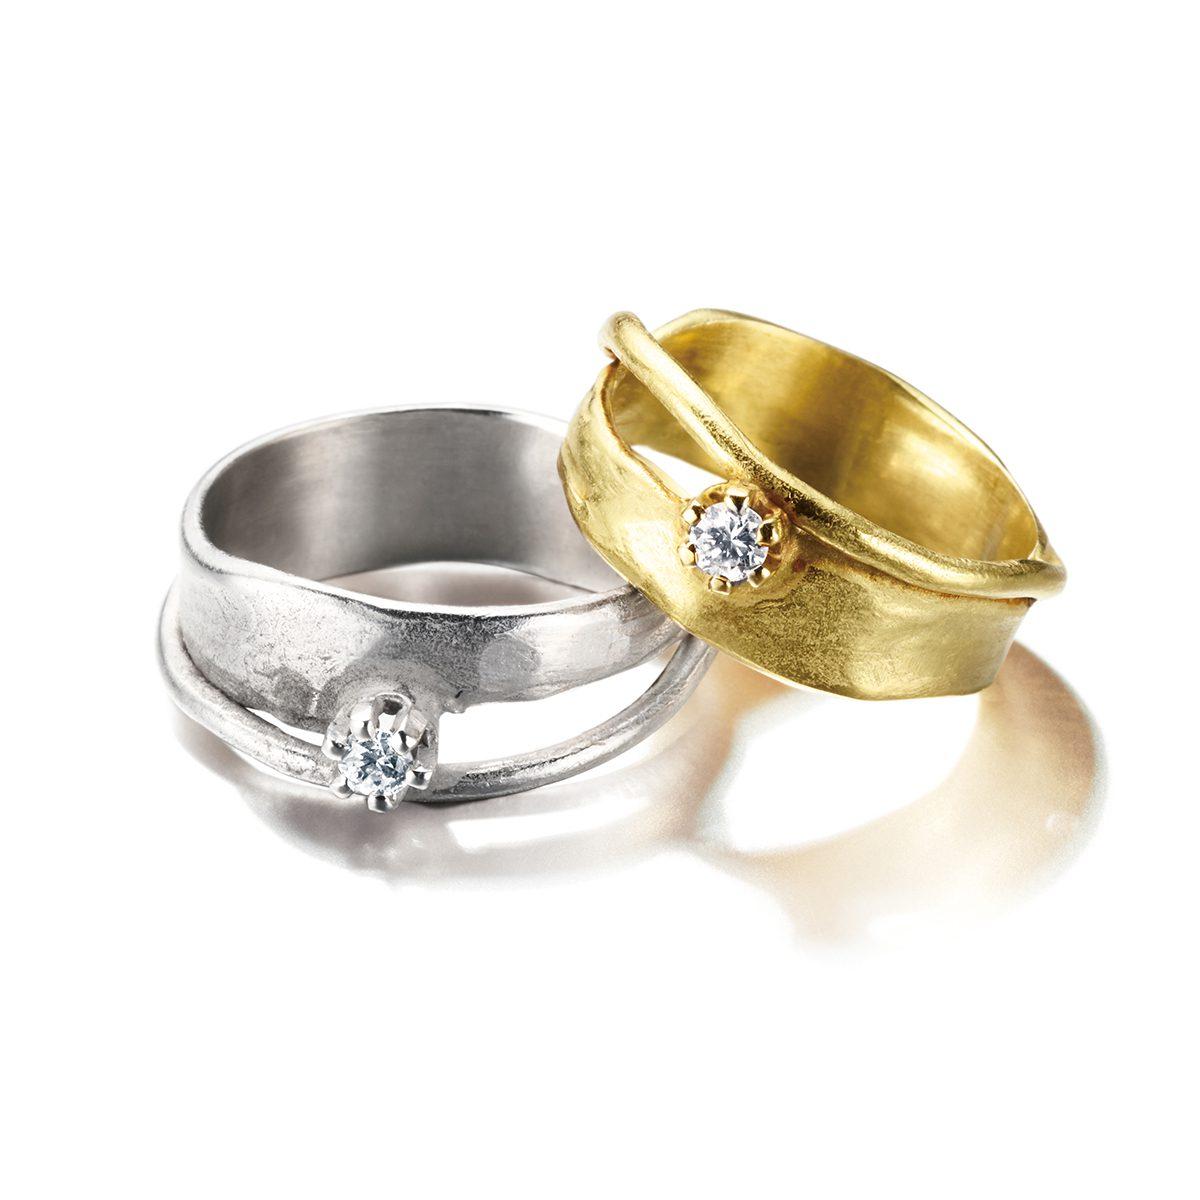 IOSSELLIANI - AMORE Marriage Rings